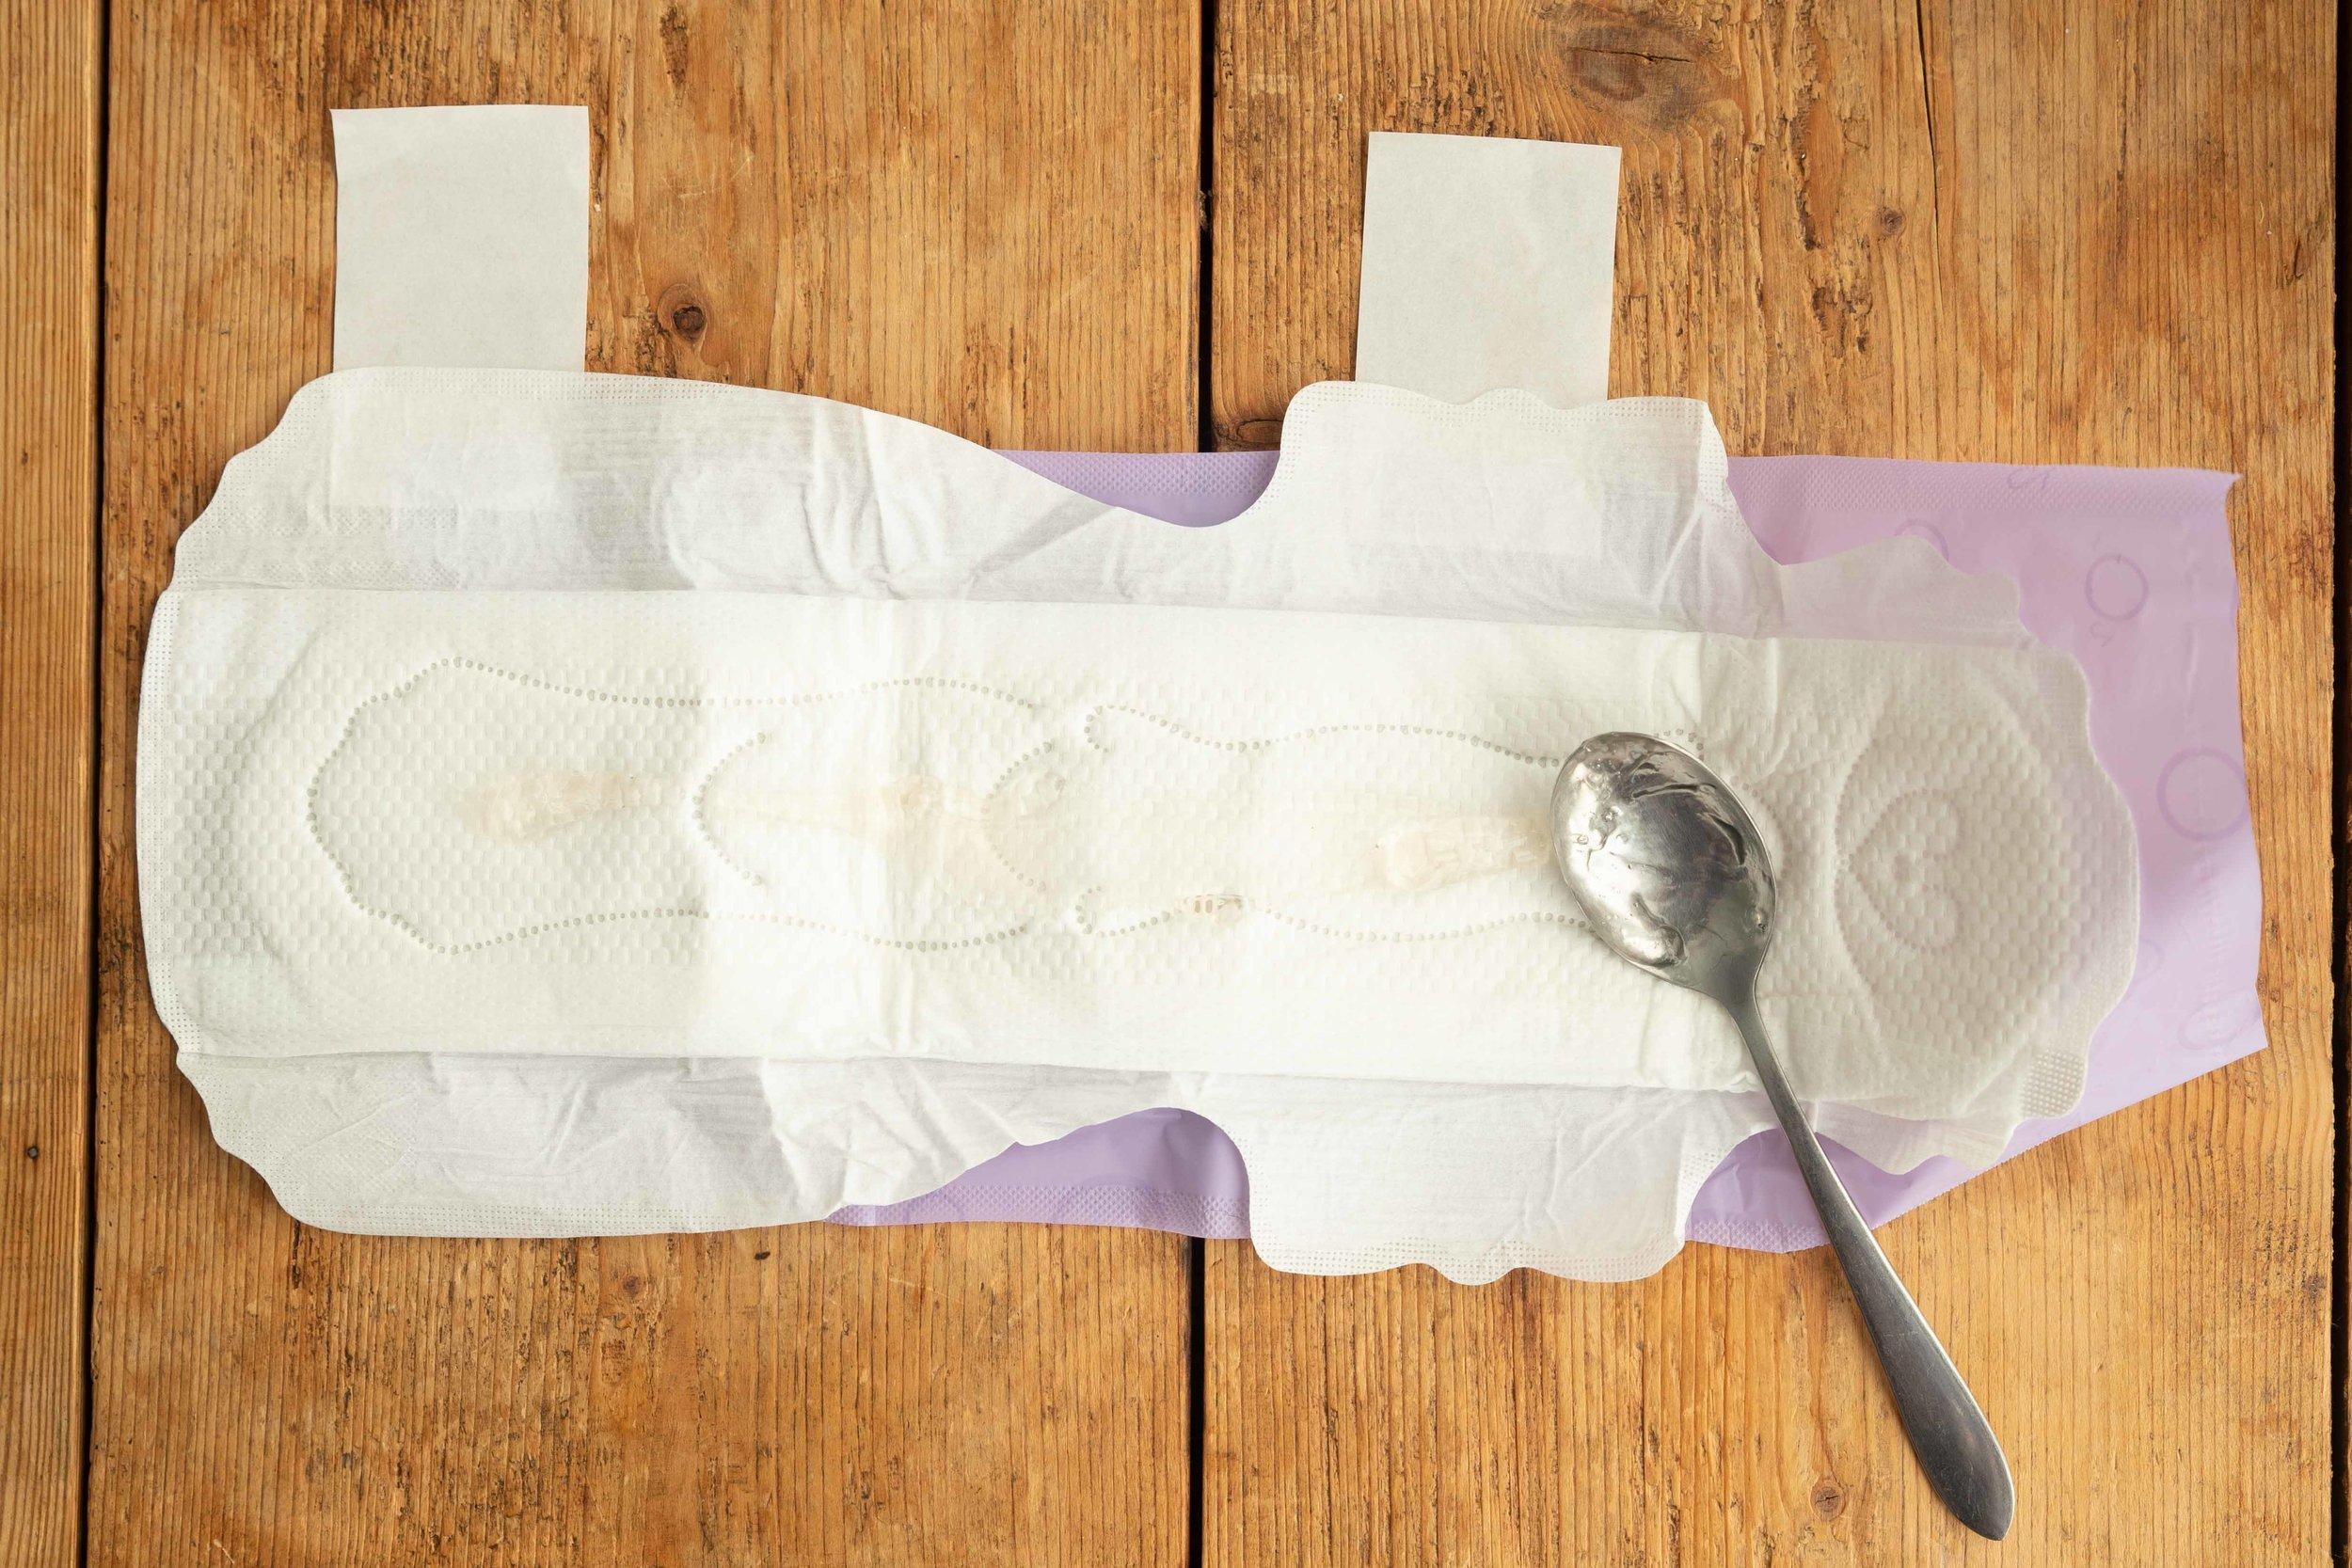 Diy maternity pad with aloe vera.jpg